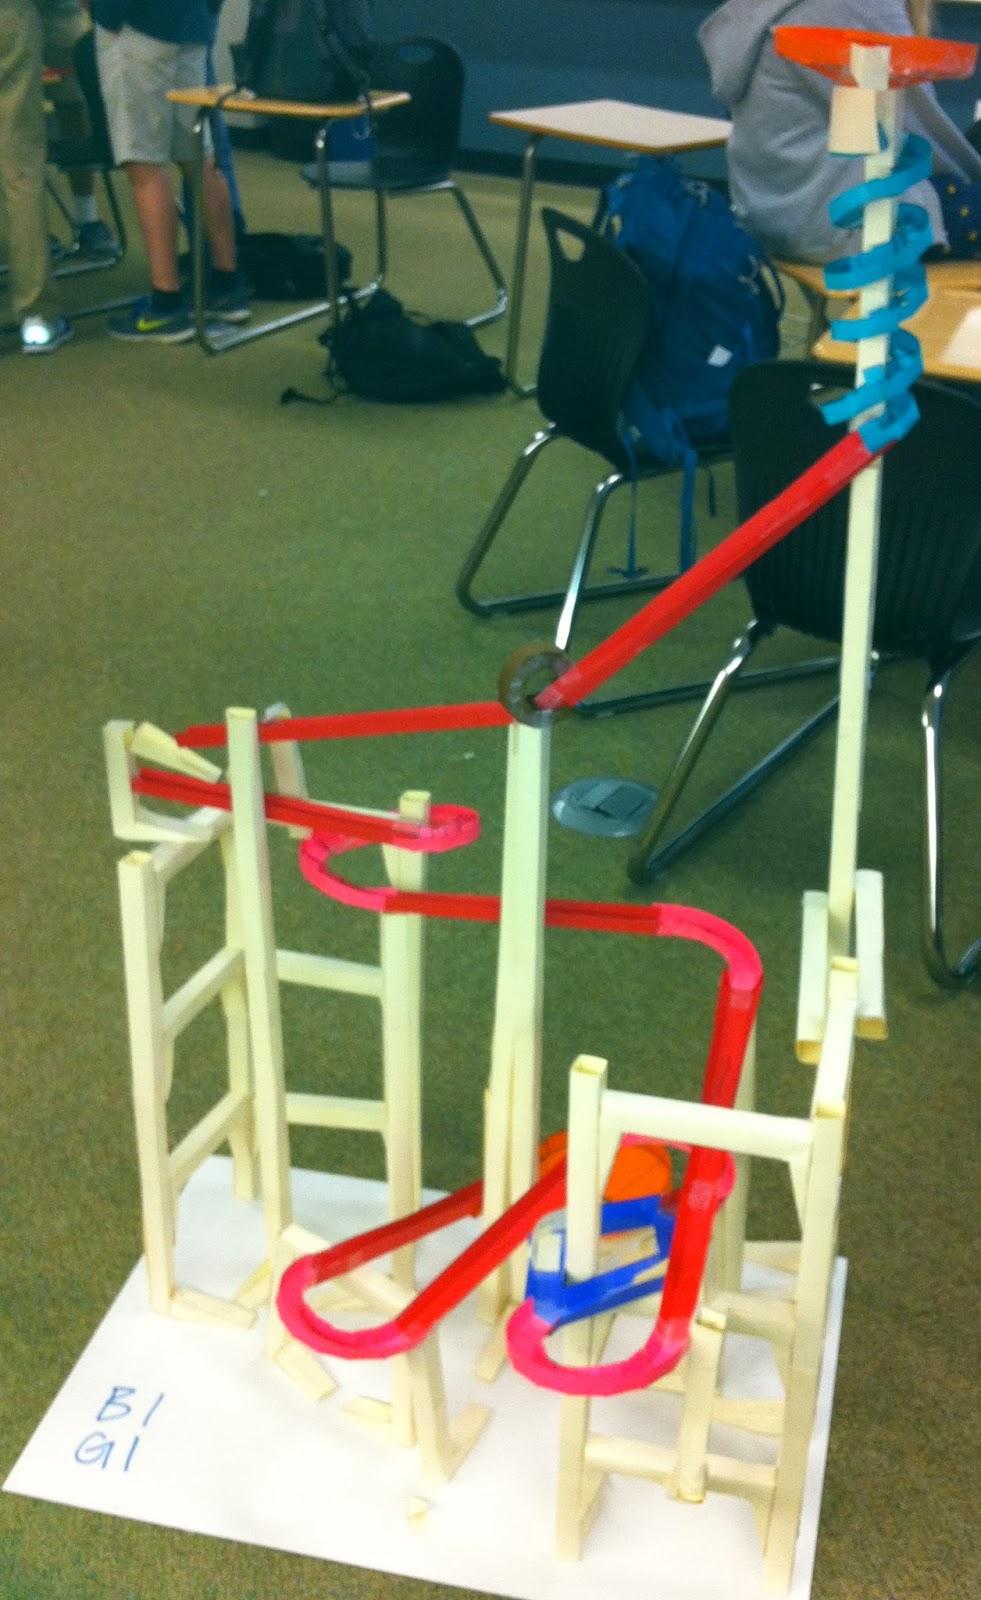 Roller Coaster STEM activity | mrseteachesmath.blogspot.com